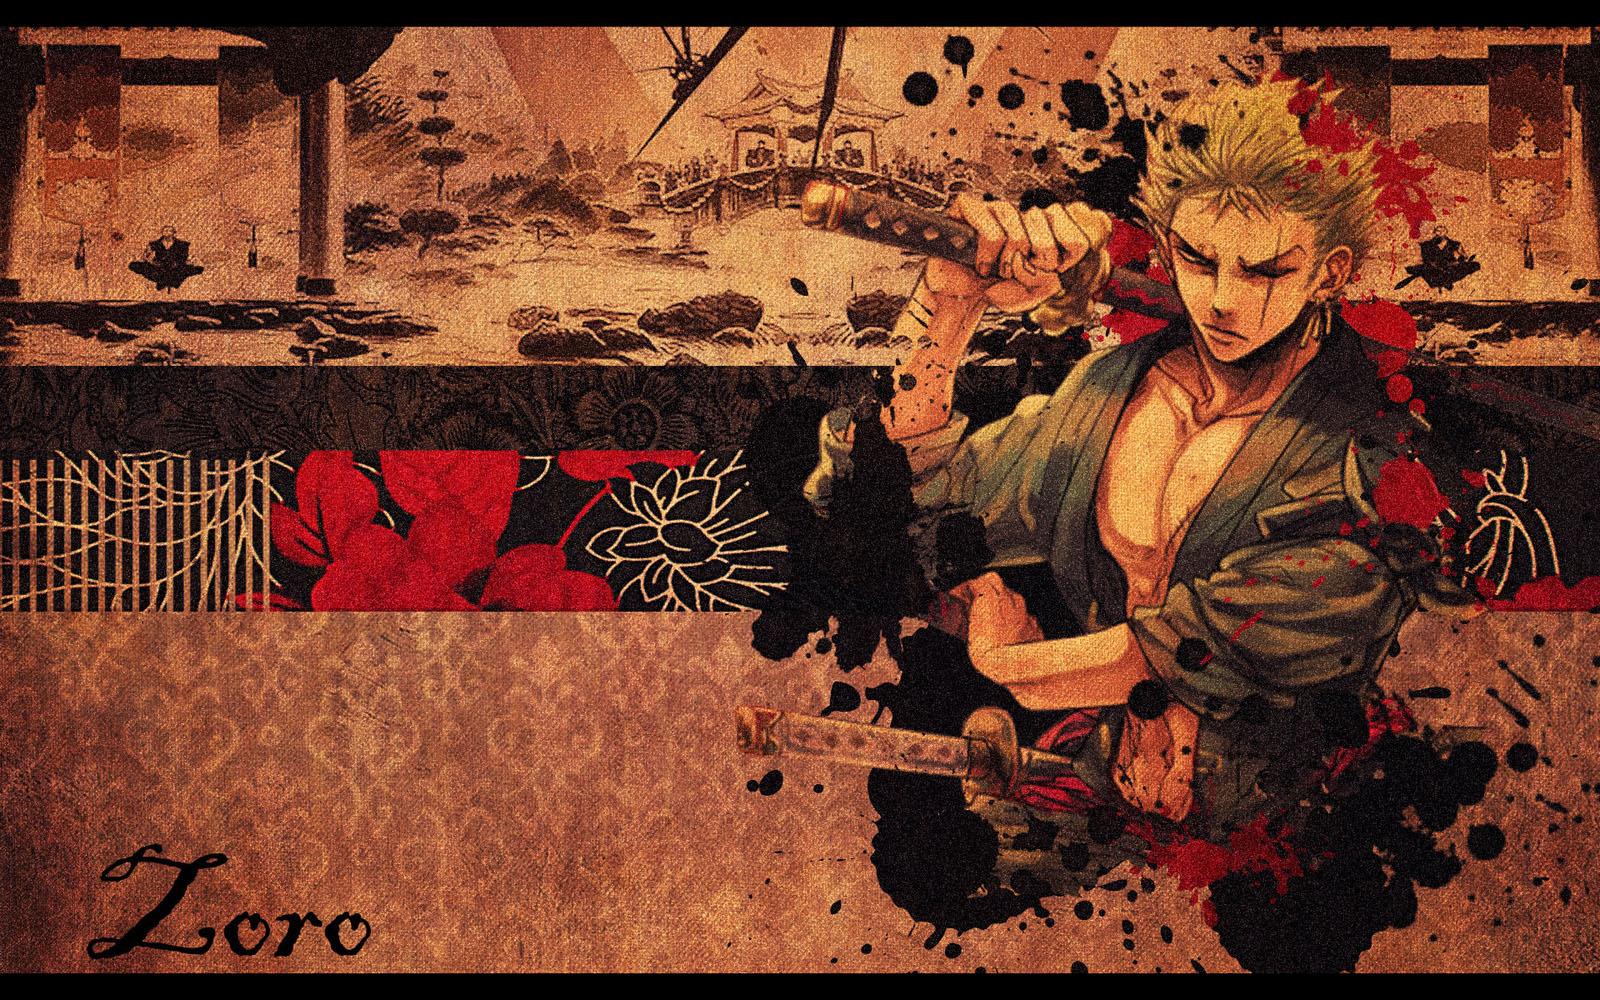 Free Download One Piece New World Zoro Widescreen Background